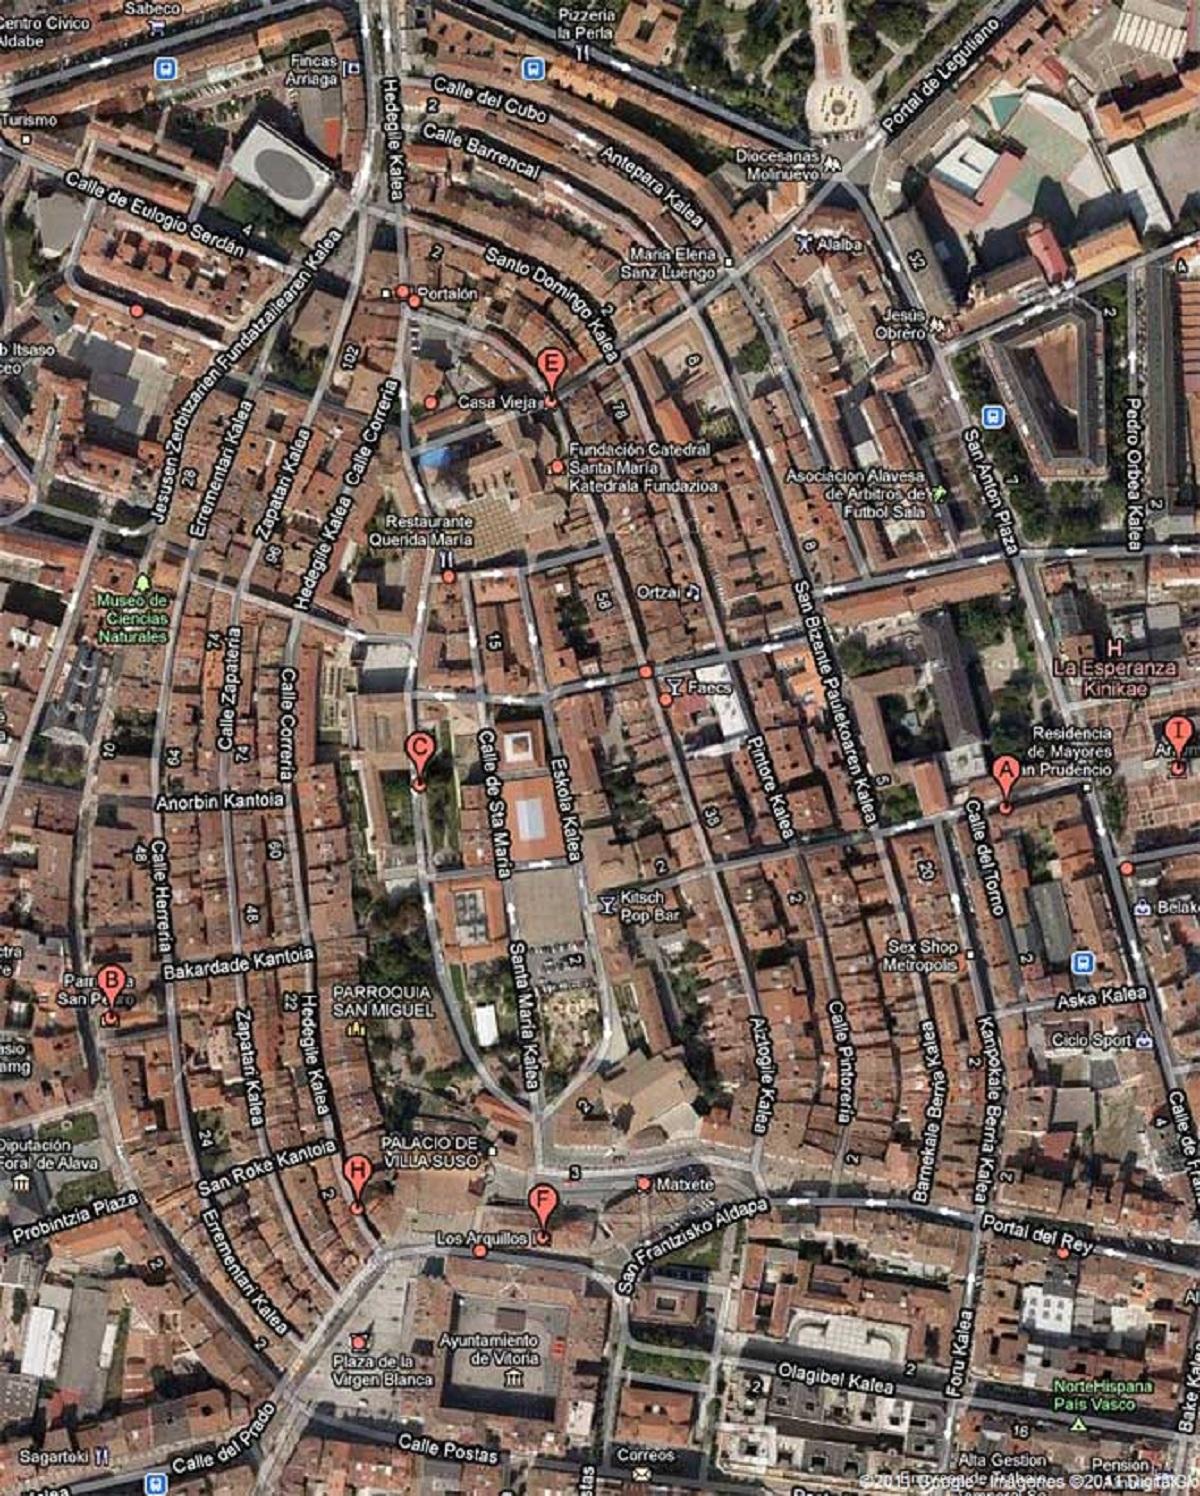 La almendra medieval de Vitoria-Gasteiz.